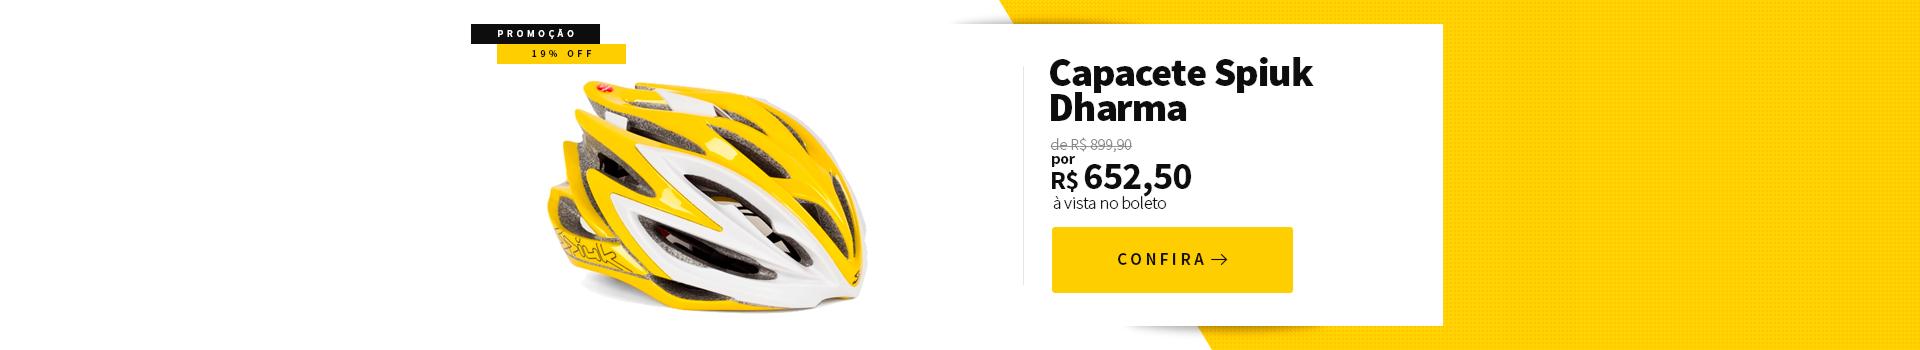 Capacete Bike Spiuk Dharma